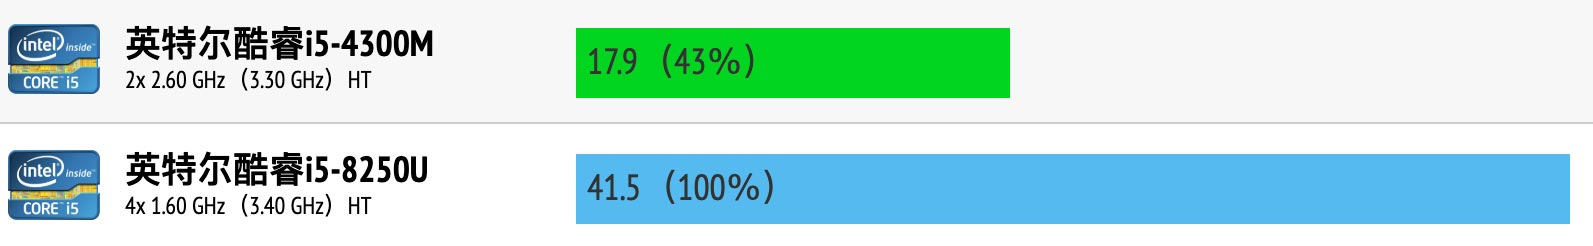 Intel Core i5-4300M和i5-8250U性能跑分对比评测